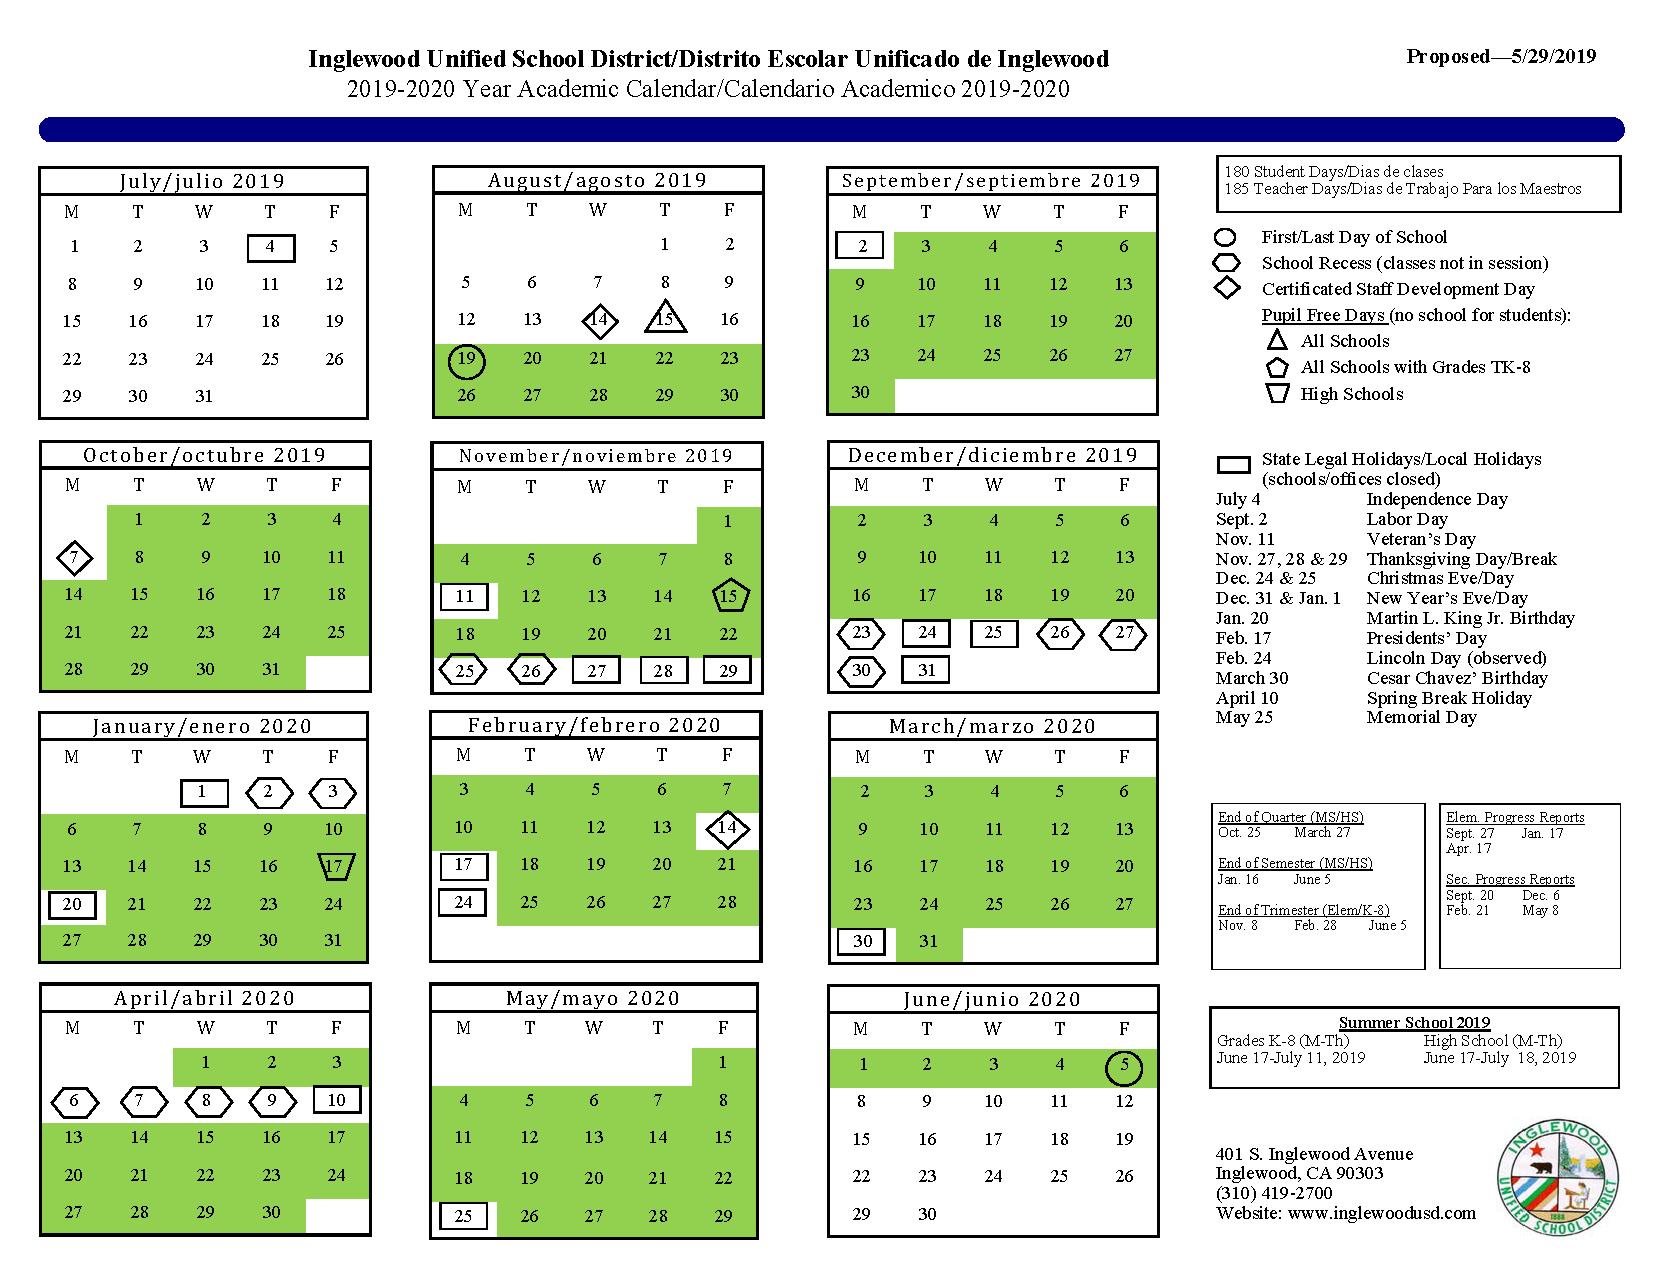 School Calendar | Coursework Sample March 2020 Regarding Corona Norco Usd School Calendar